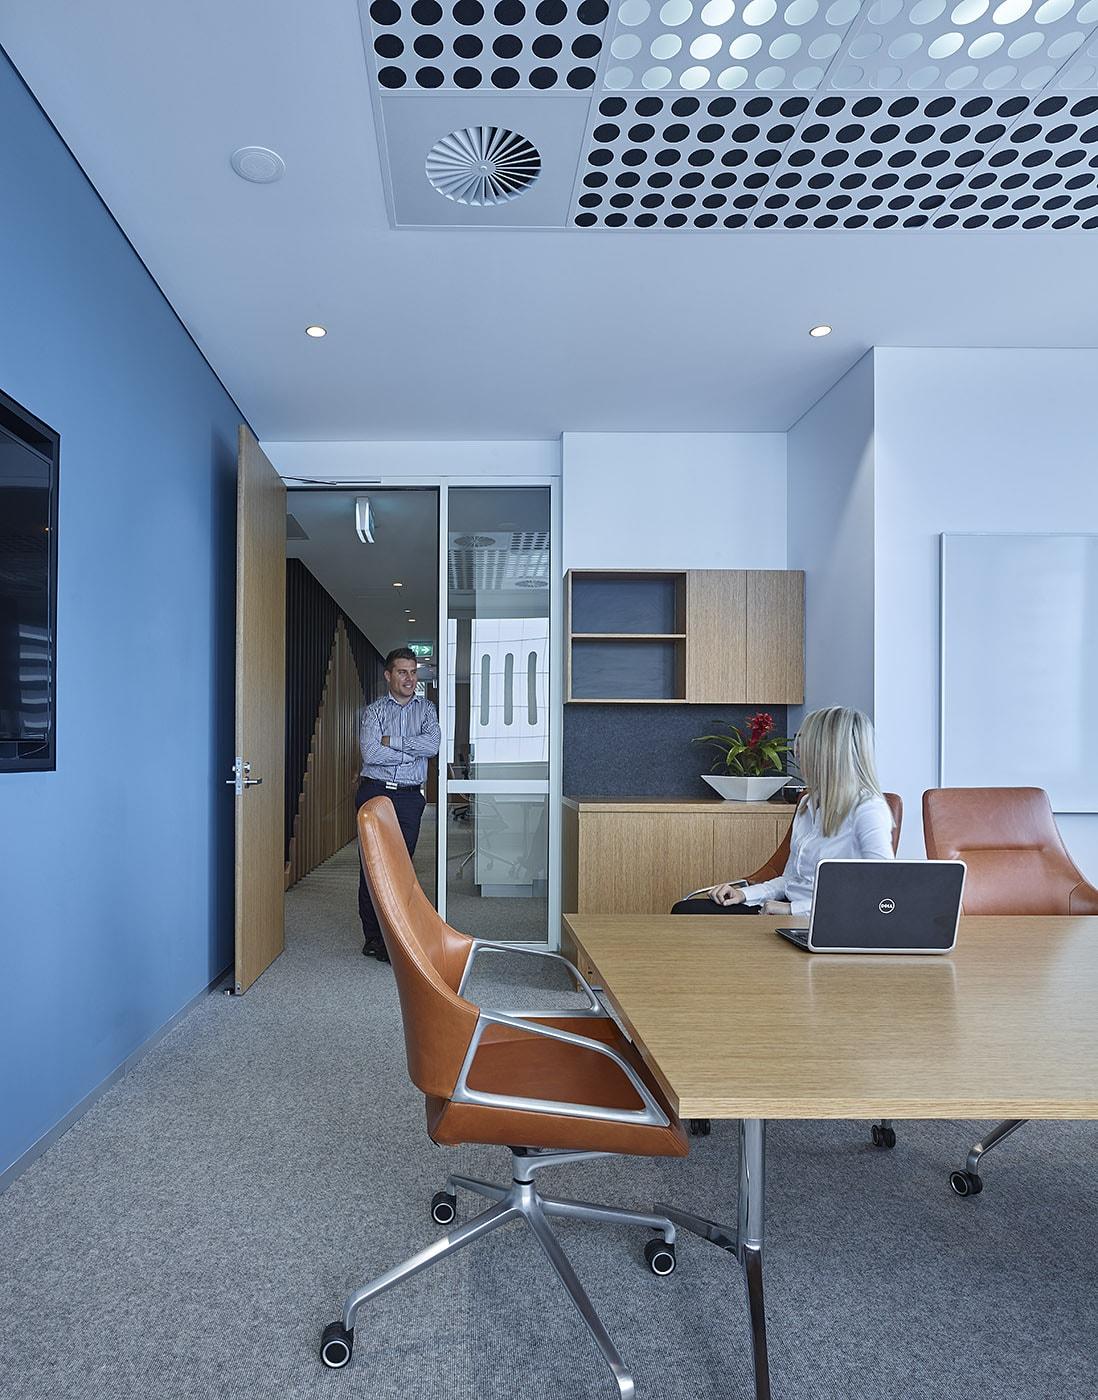 Ausure Brisbane Tenant Representation, Interior Design, Project & Construction Management Project Image 8 by PCG